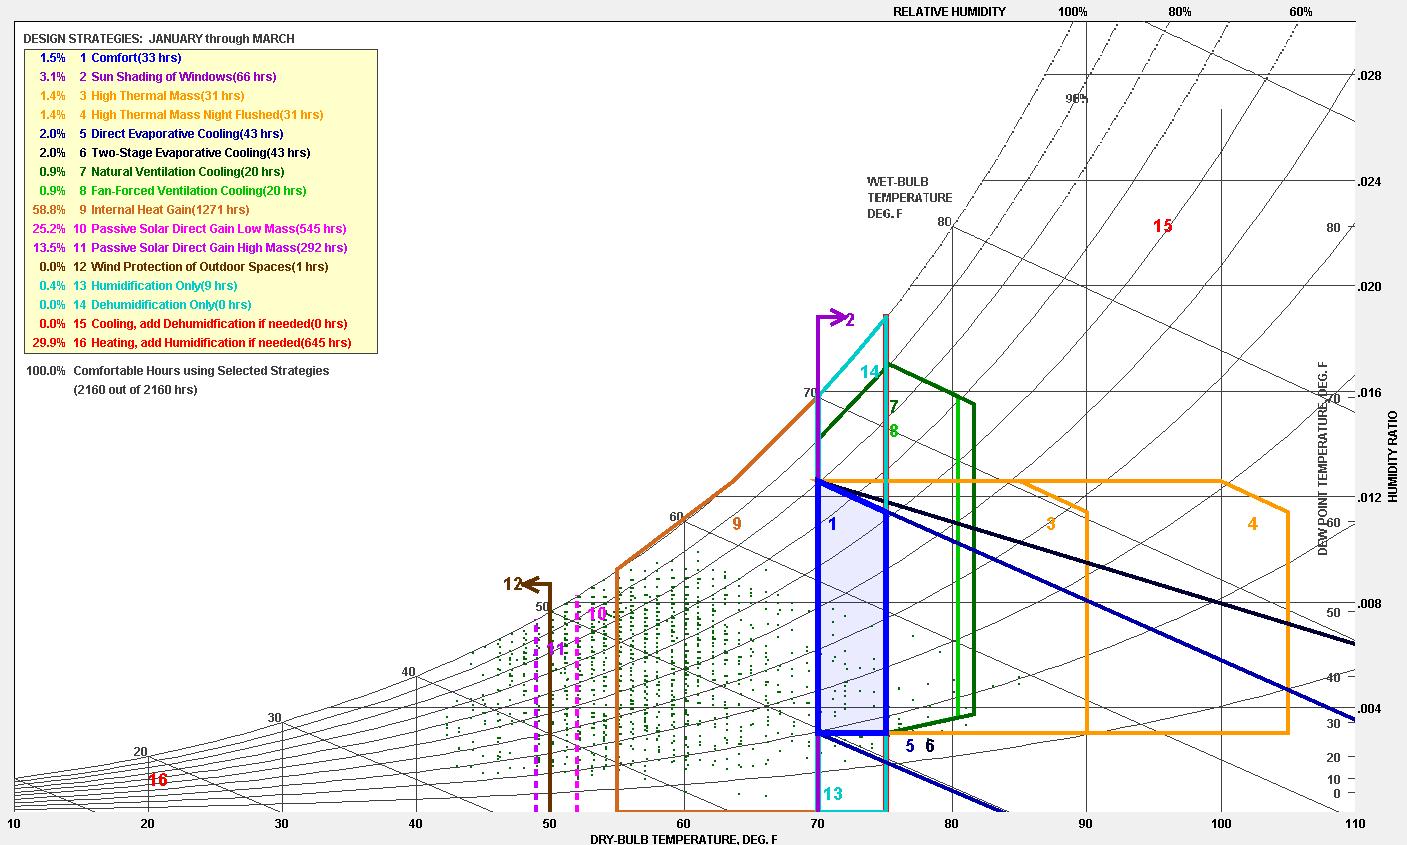 hight resolution of image psychrometric chart of los angeles ca usa jan through mar